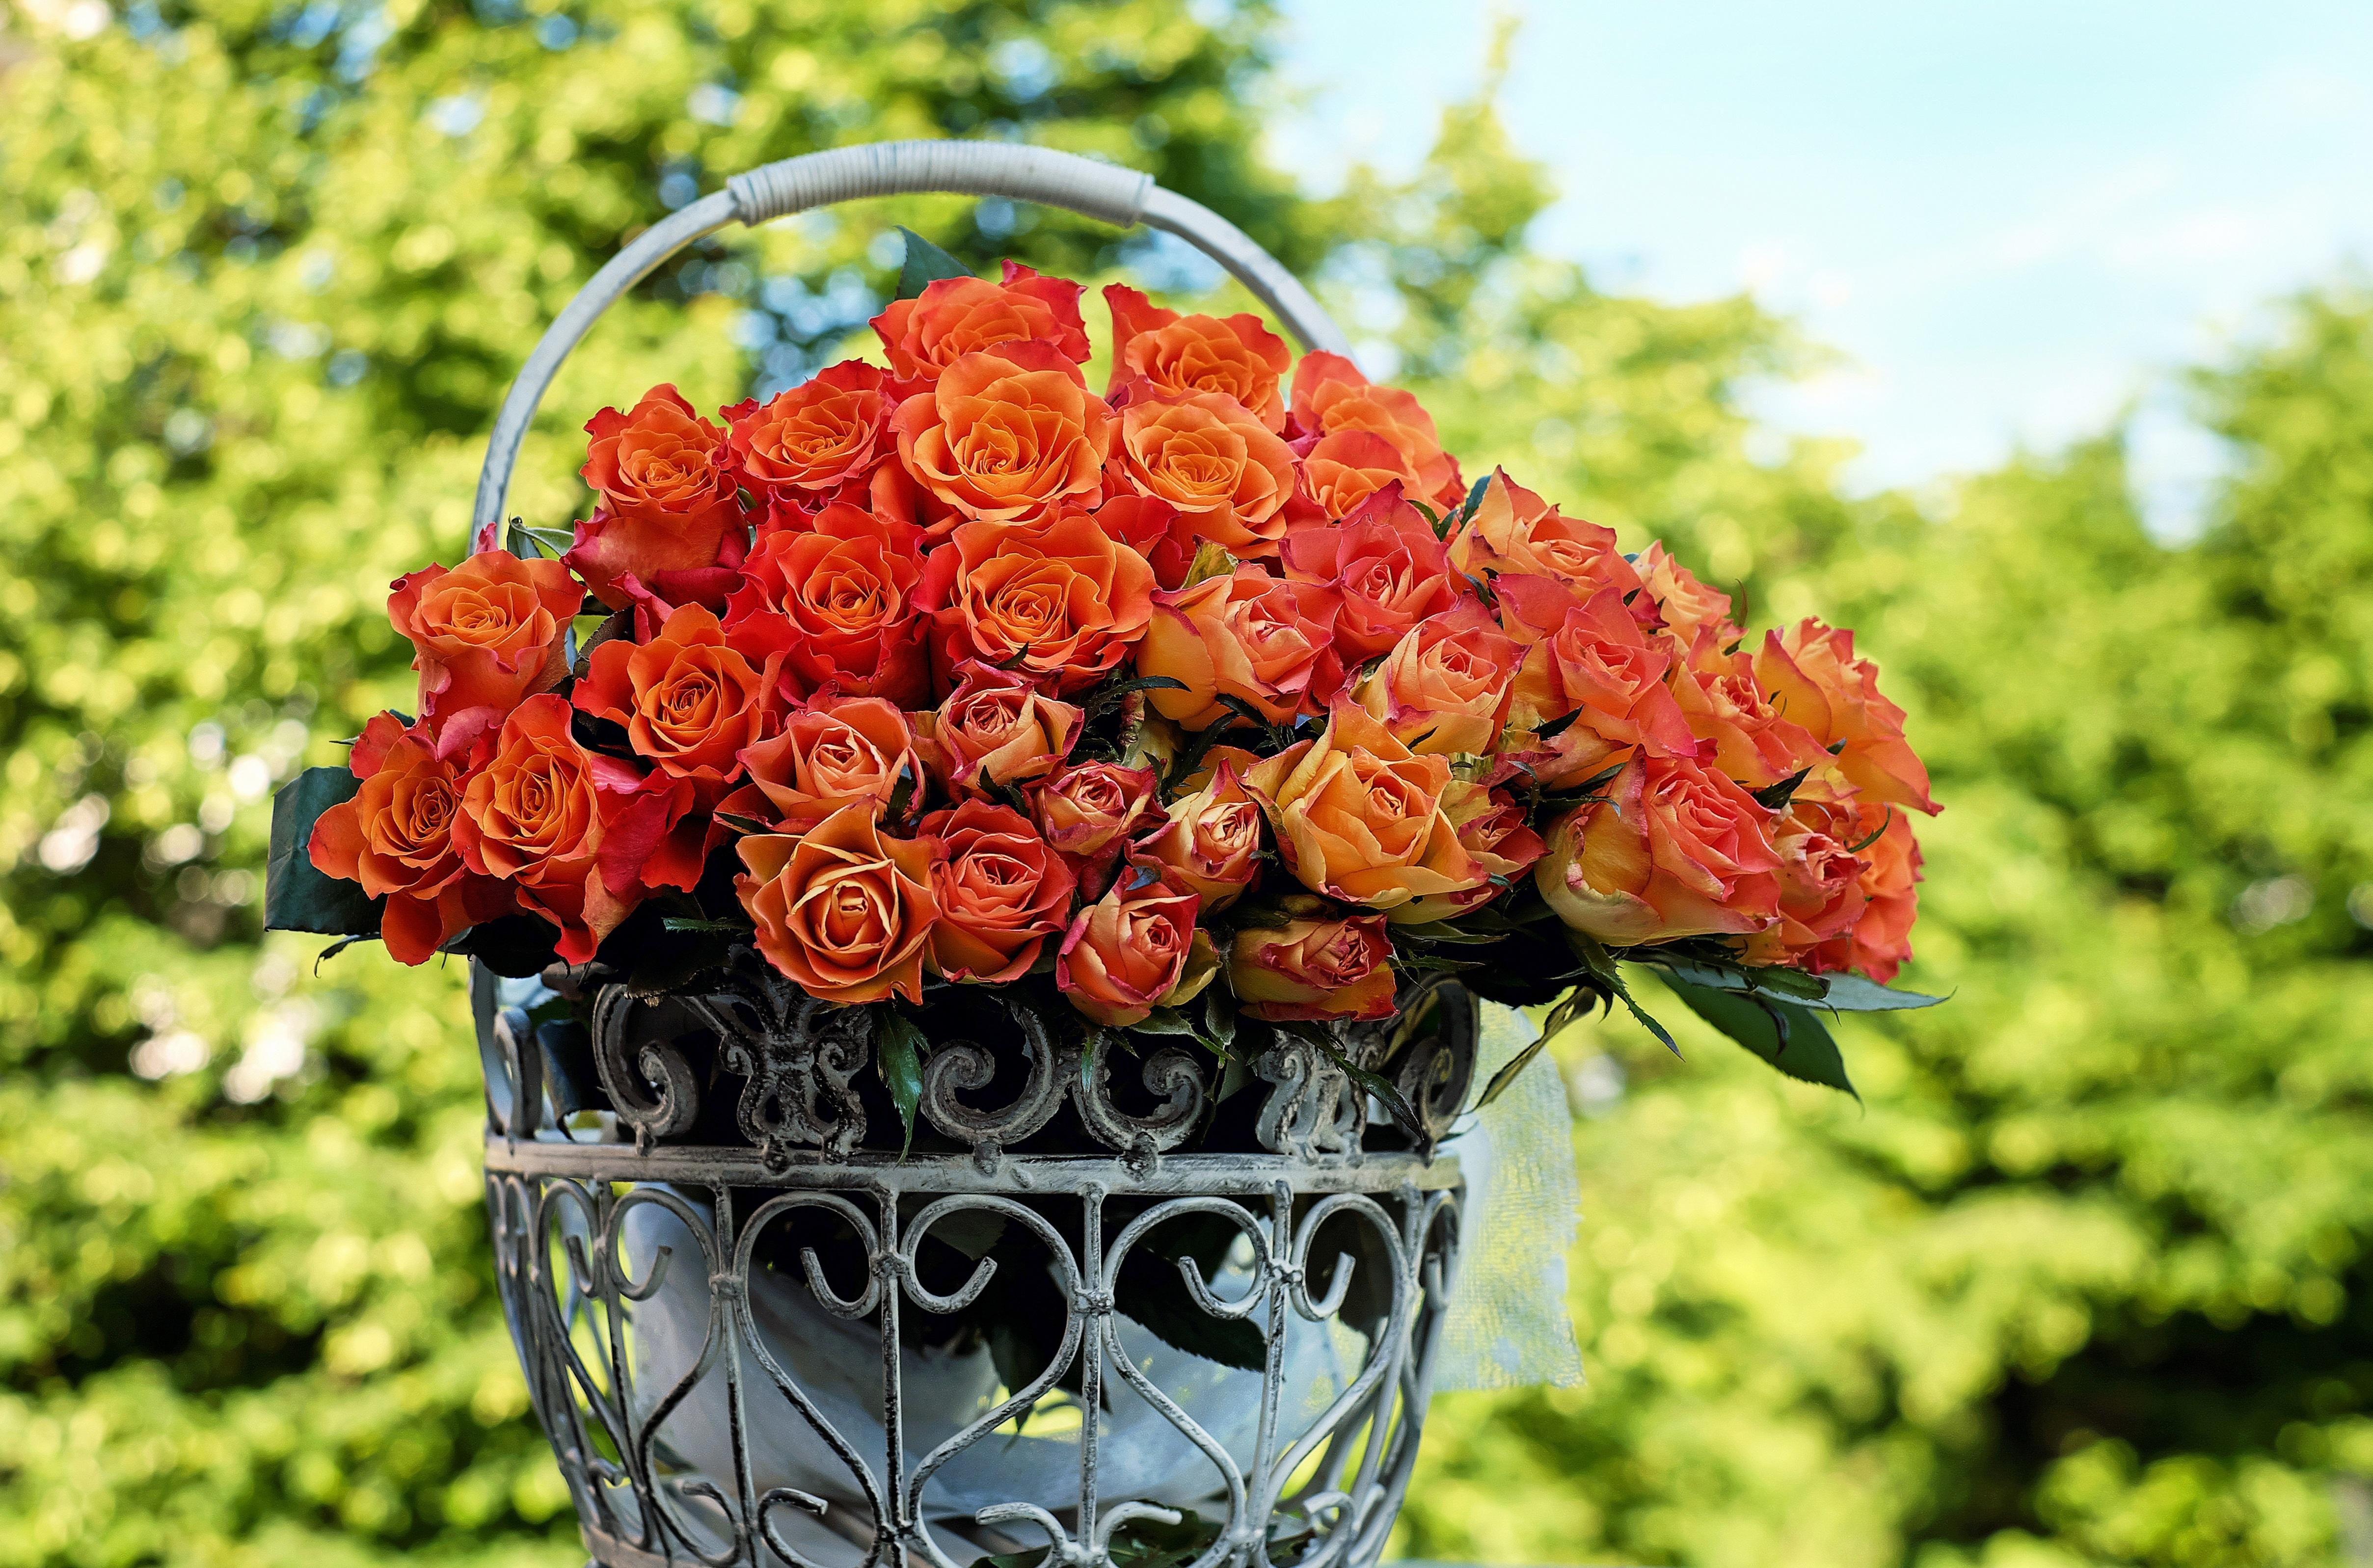 How to Plant a Cut Flower Garden